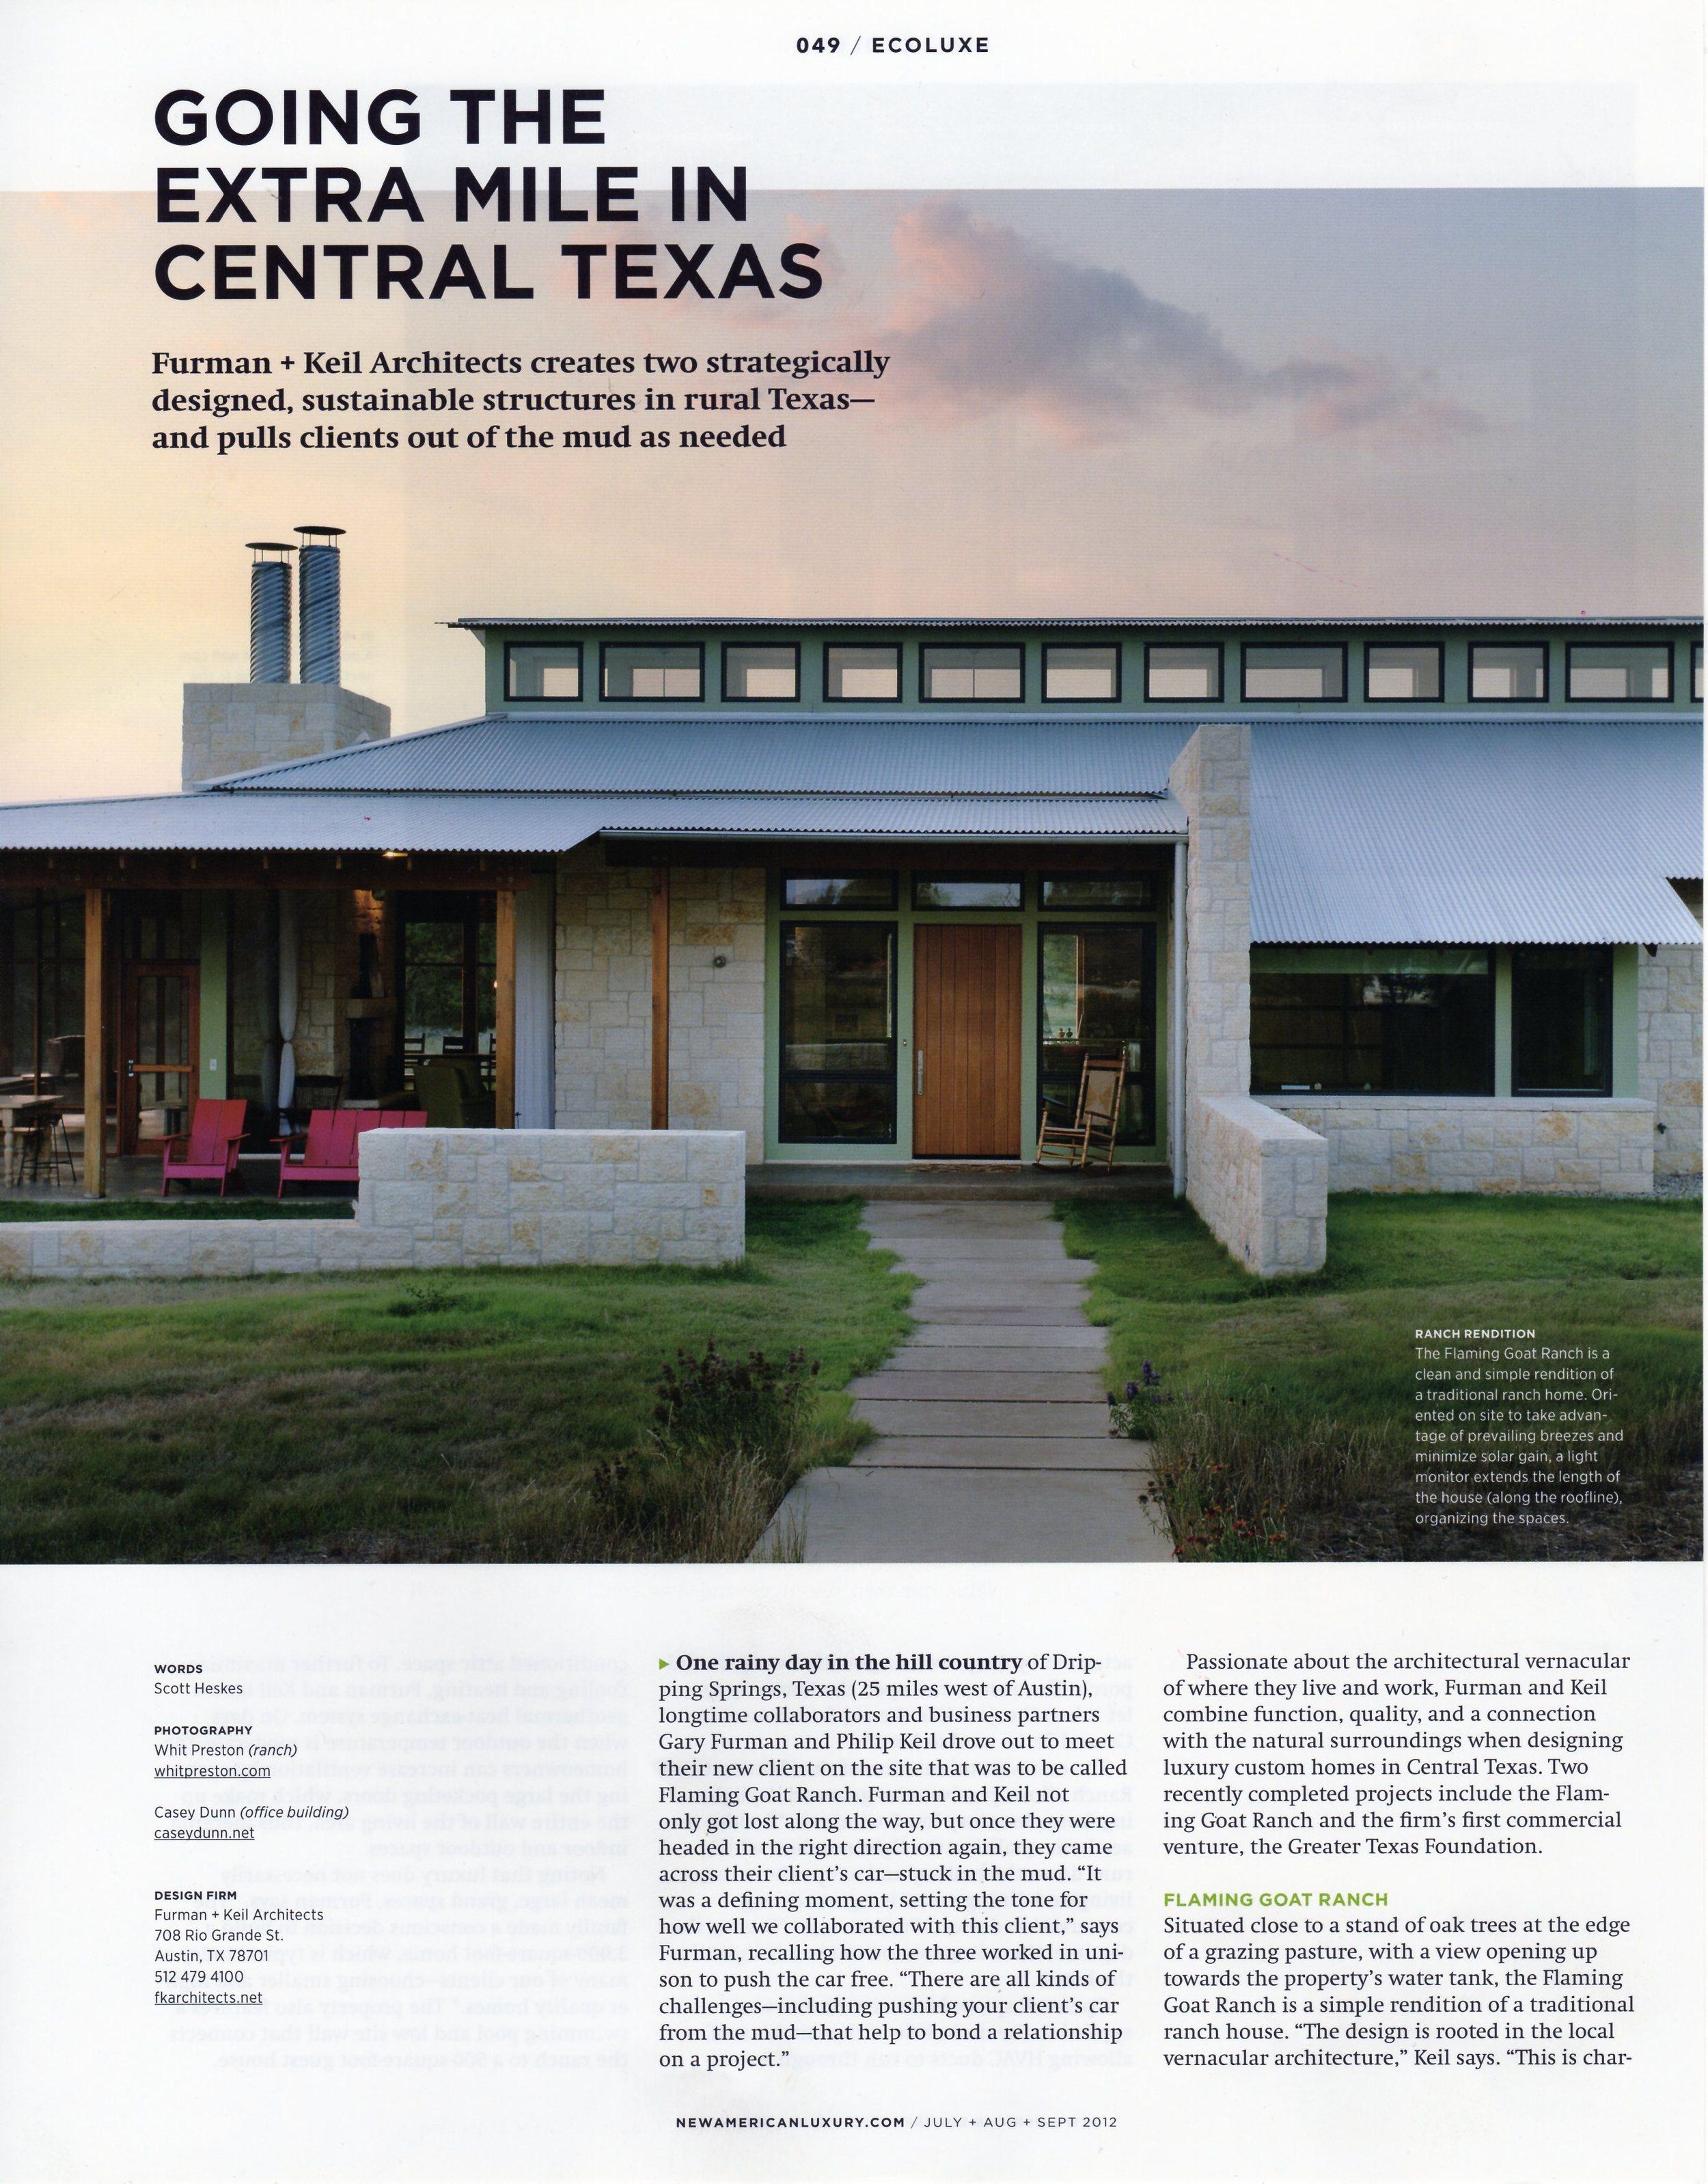 furman_keil_architects_flaming_goat_new_american_luxury.jpg